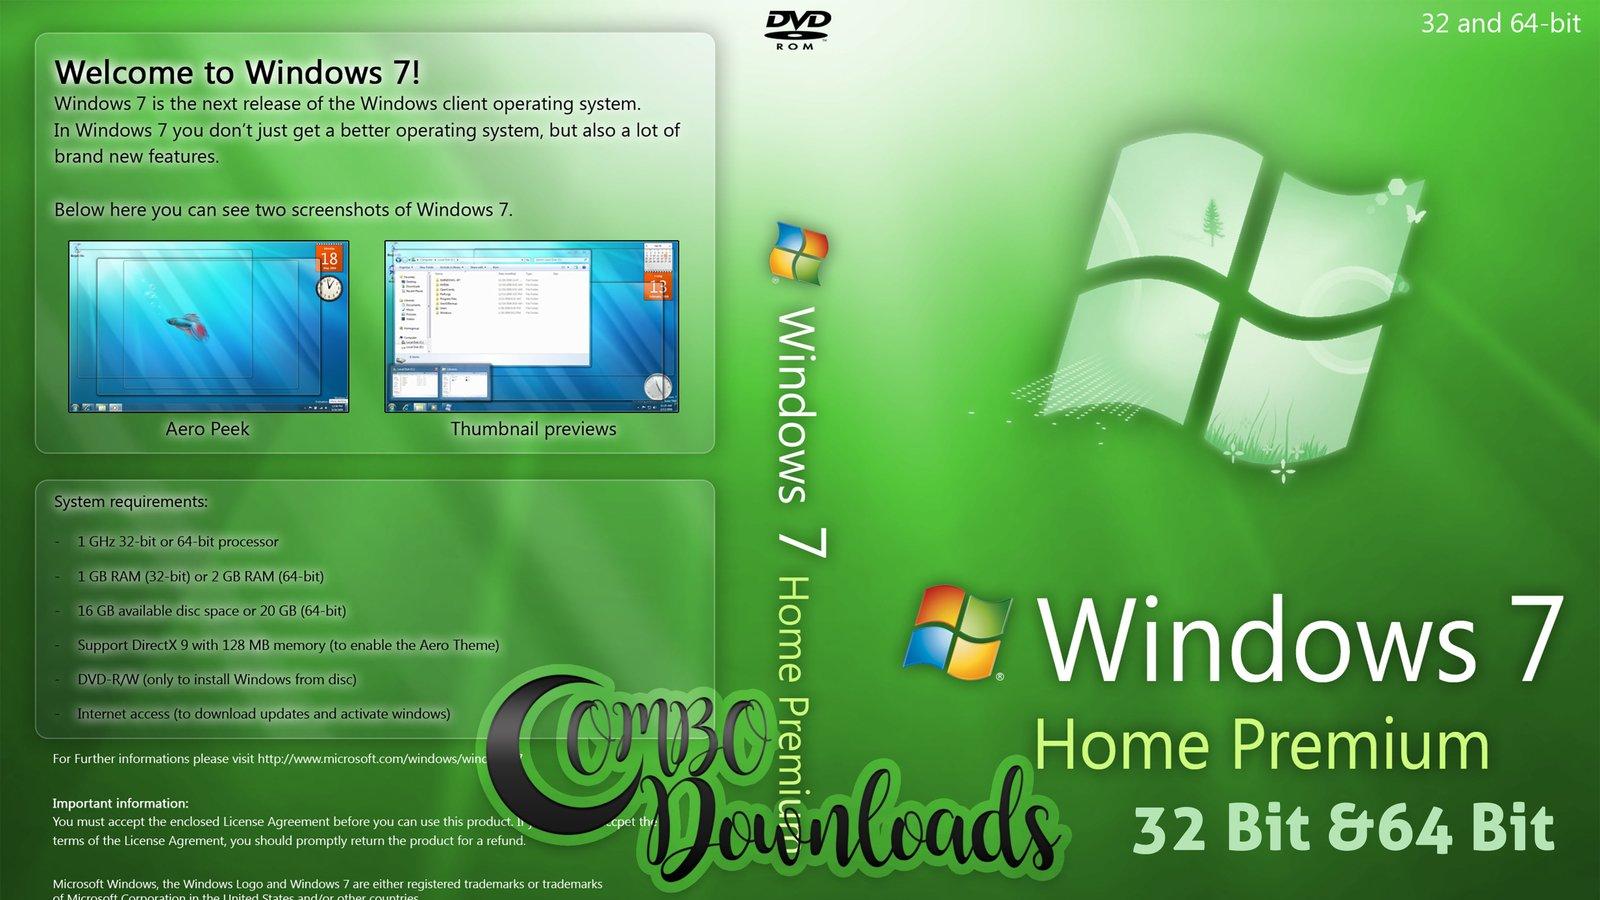 baixar windows 7 home premium 32 bits torrent